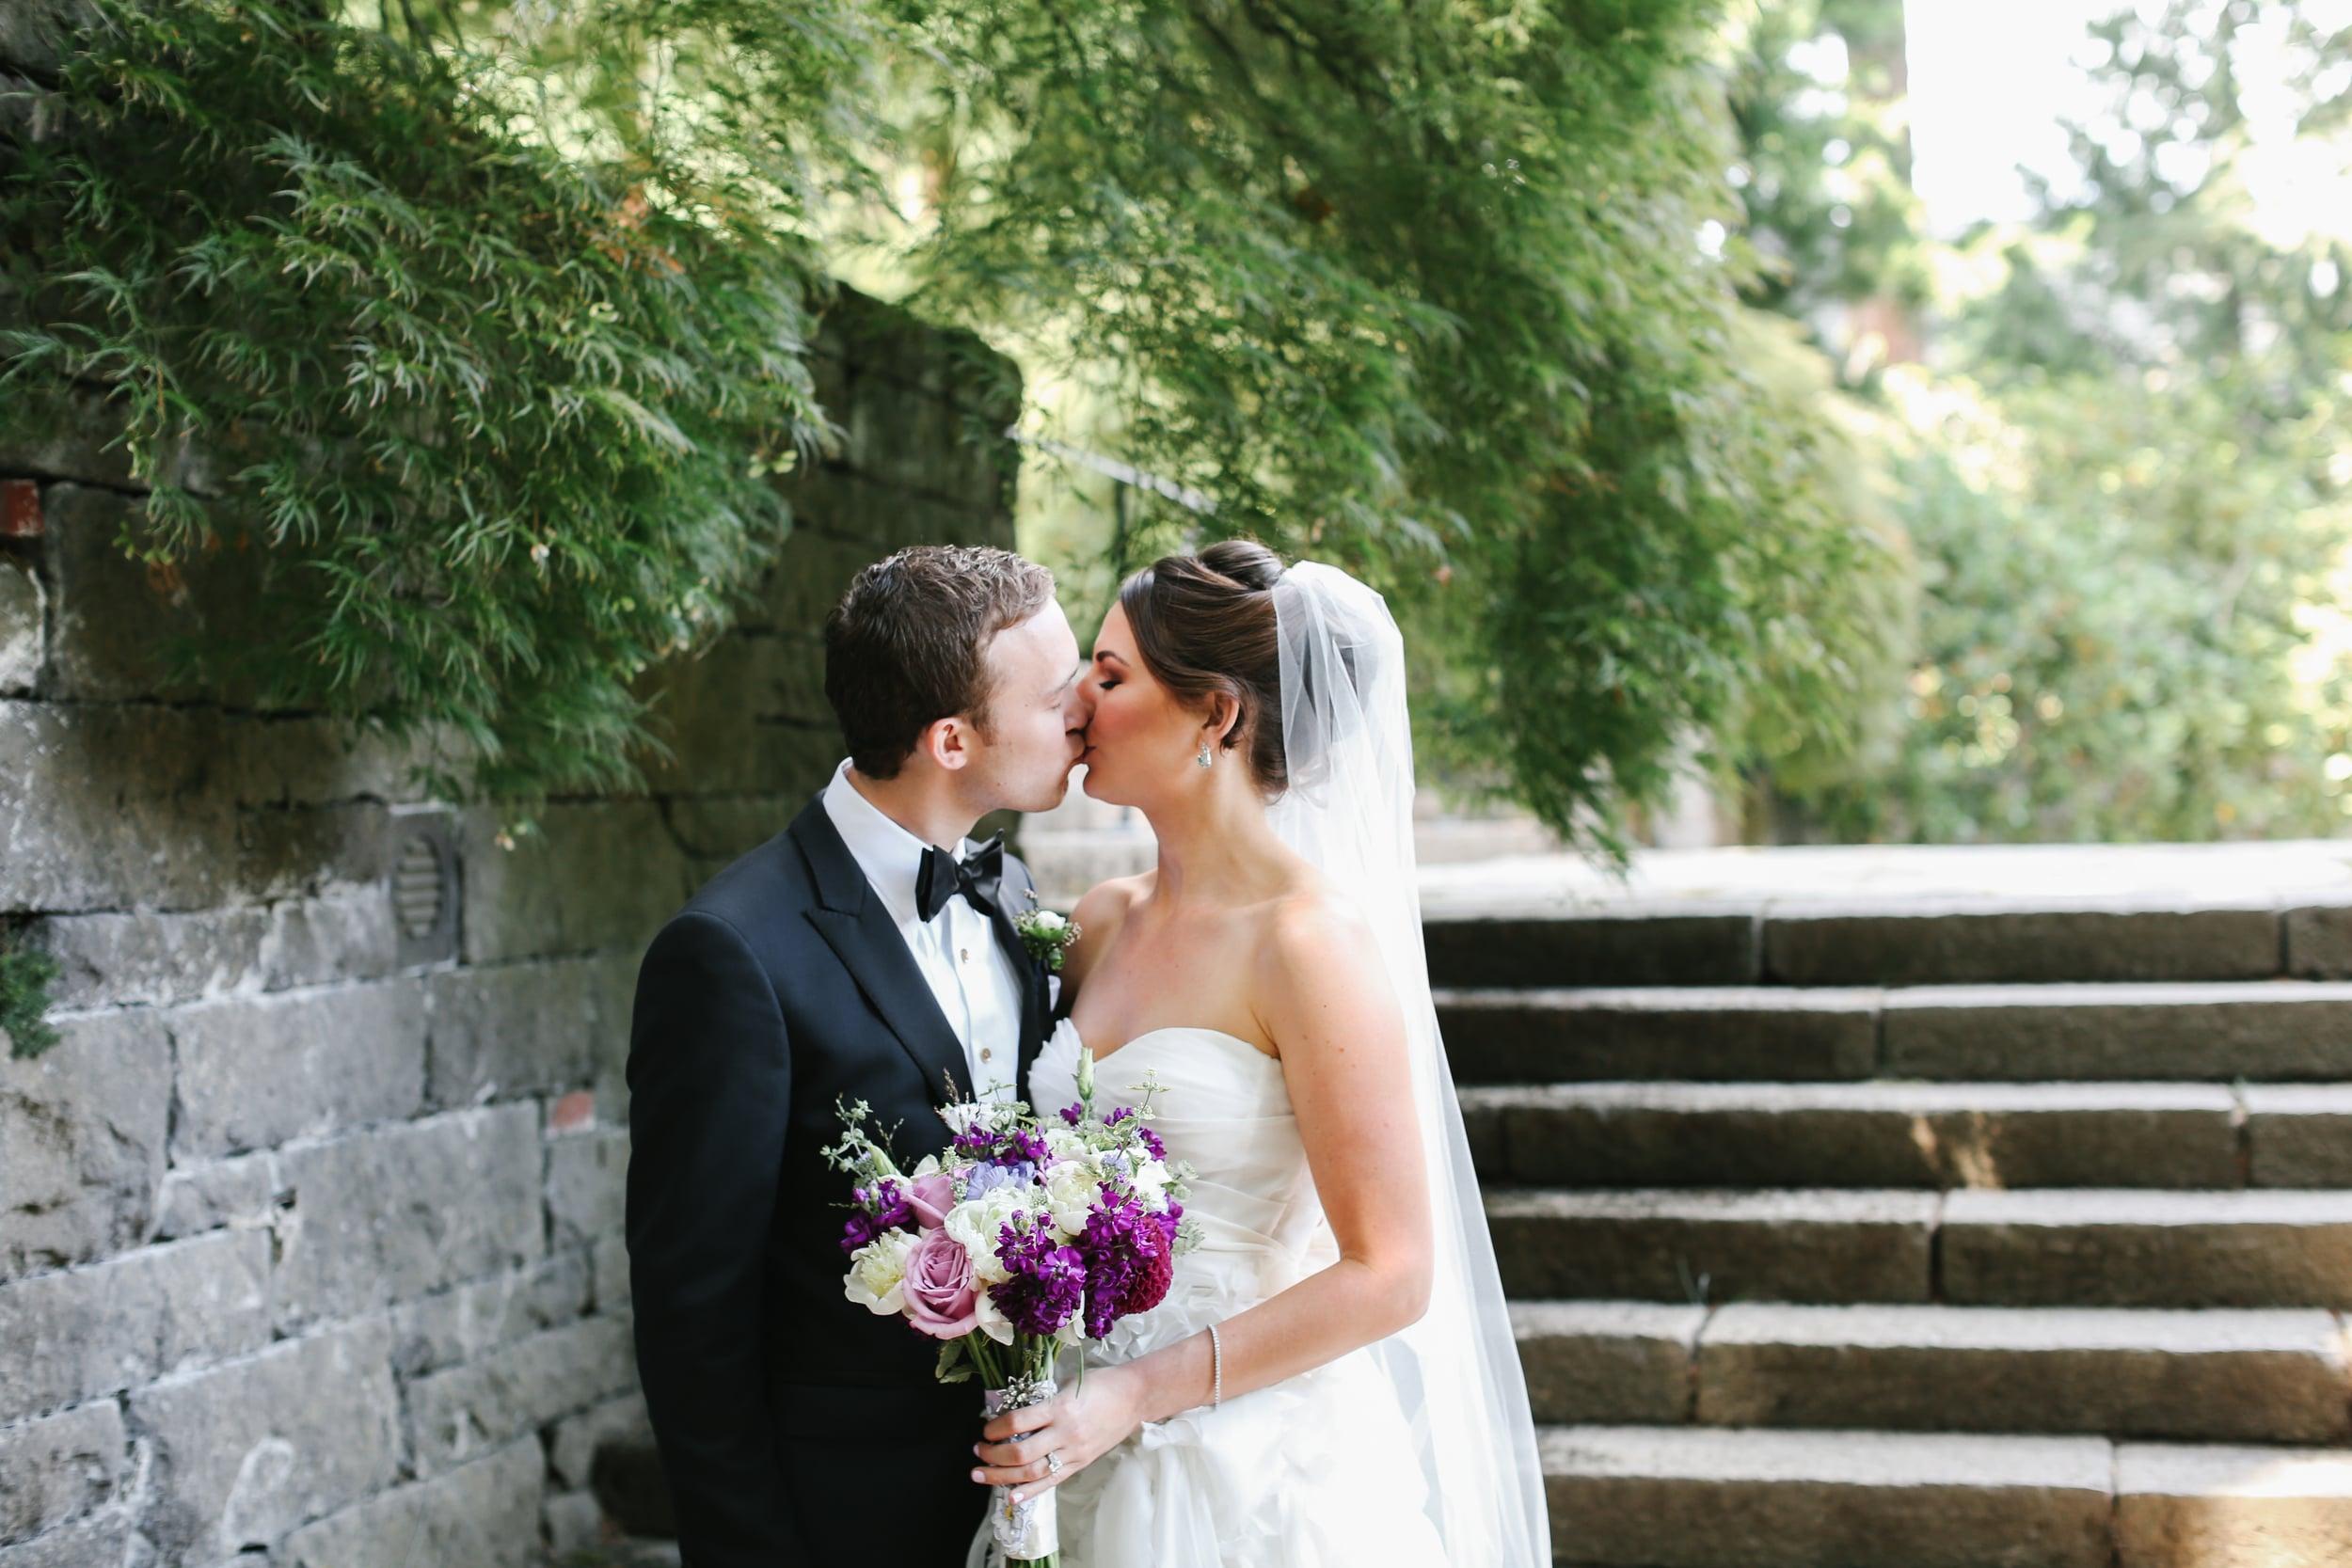 S&S - Love Lit Wedding Photography-10.jpg